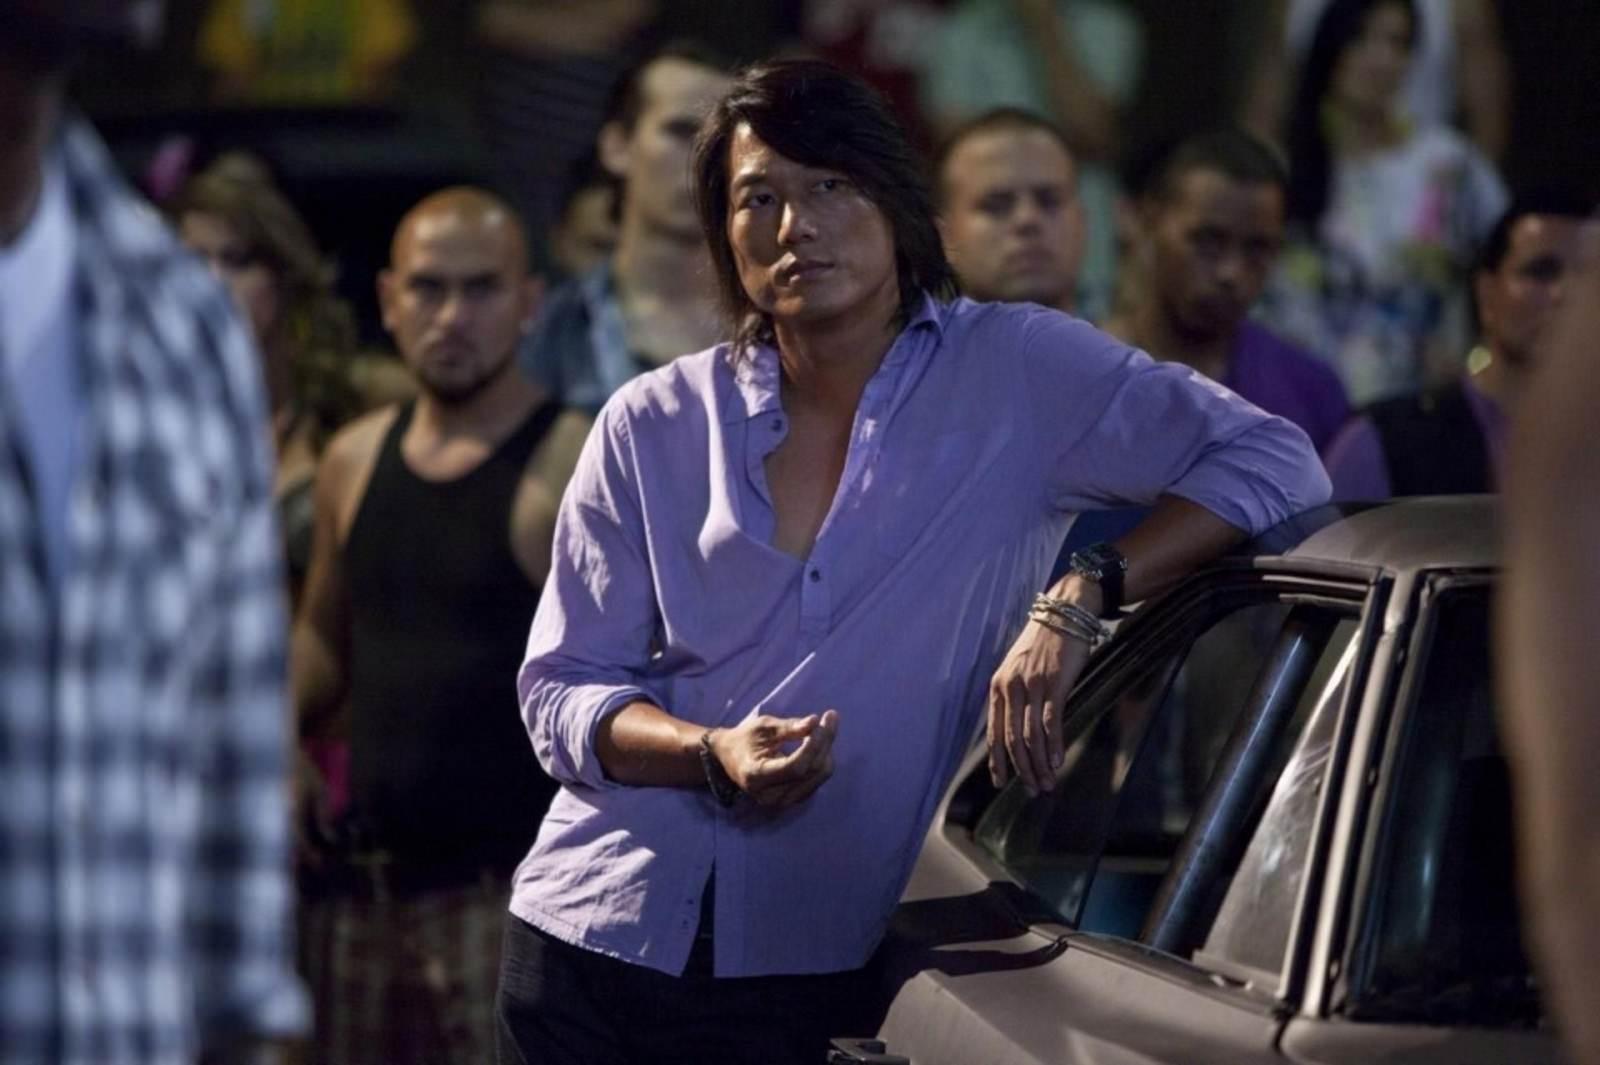 Movie, Fast Five(美國, 2011年) / 玩命關頭5(台灣) / 速度与激情5(中國) / 狂野時速5(香港), 電影角色與演員介紹